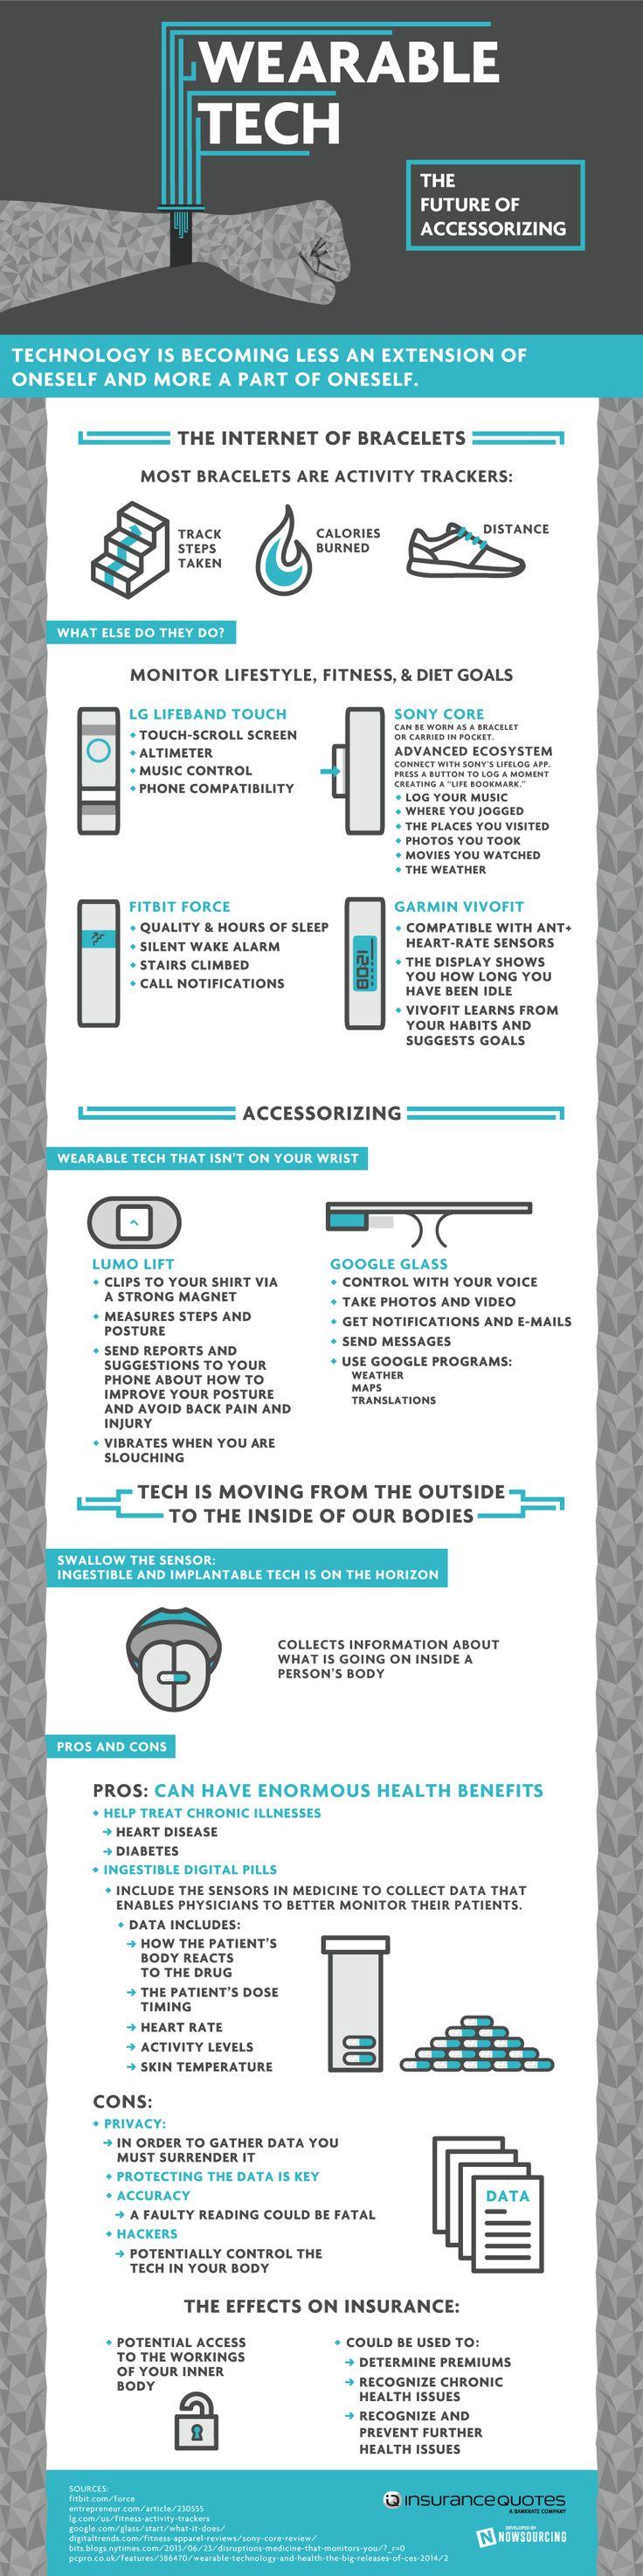 Wearable Tech The Future Of Accessorizing #futureofhealth